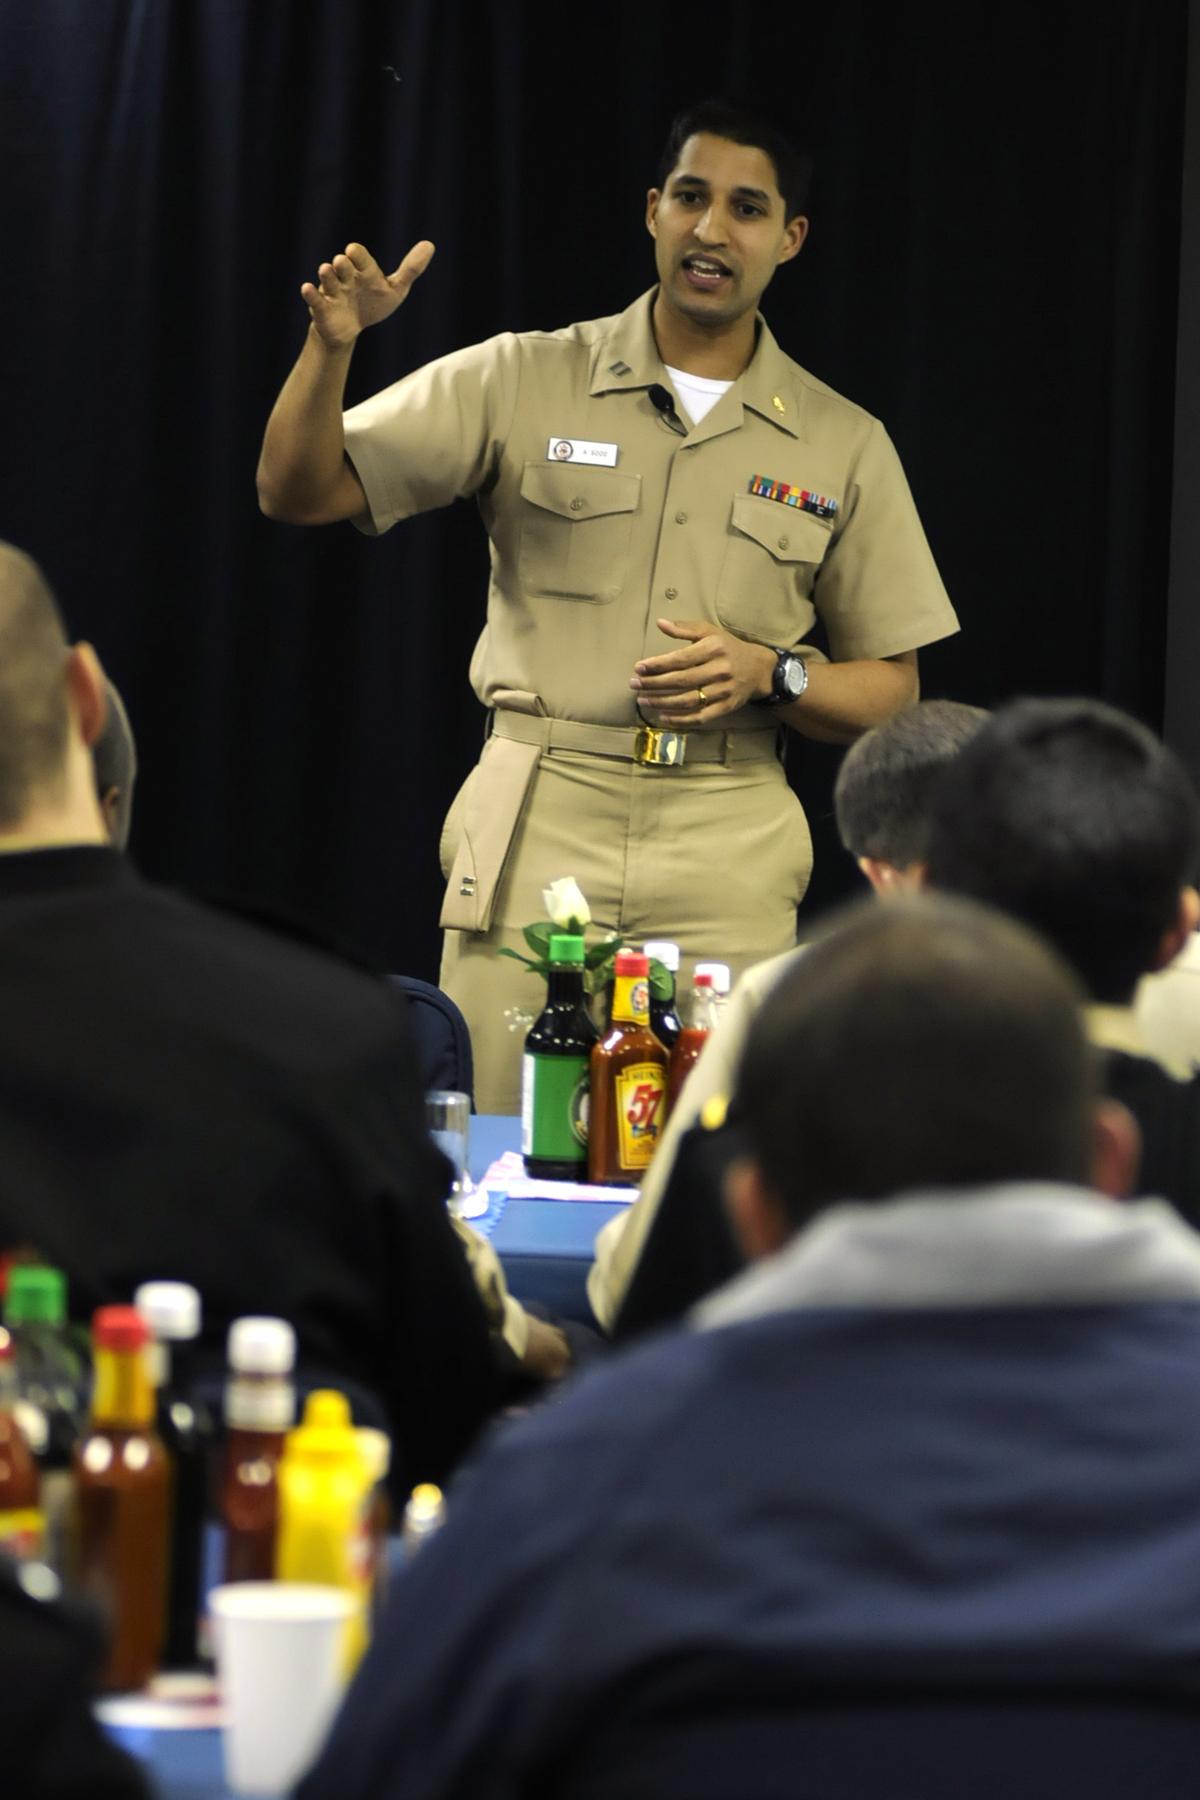 File:US Navy 081114-N-8546L-198 Lt  Amit Sood, a clinical dietitian